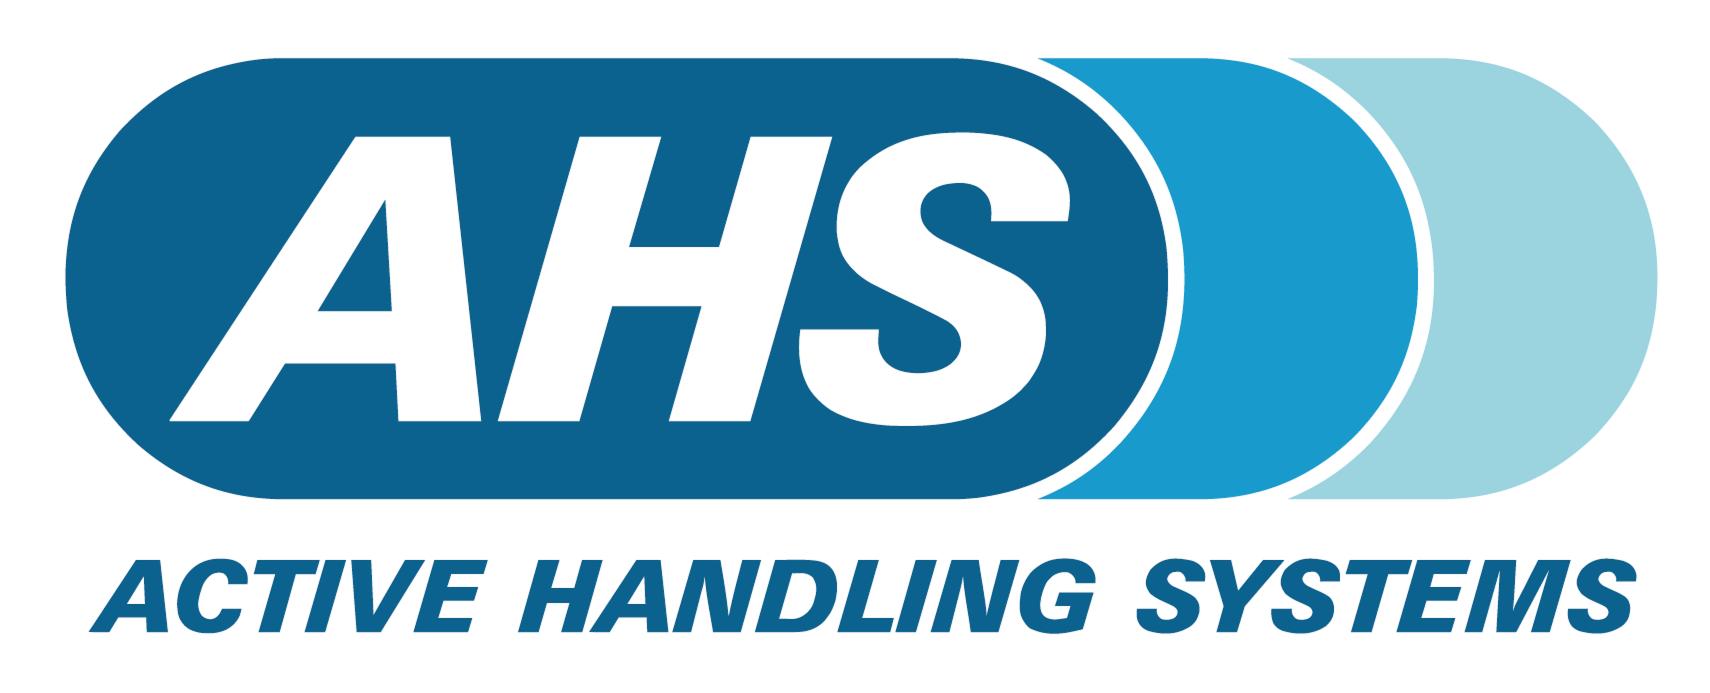 Active Handling Systems Ltd